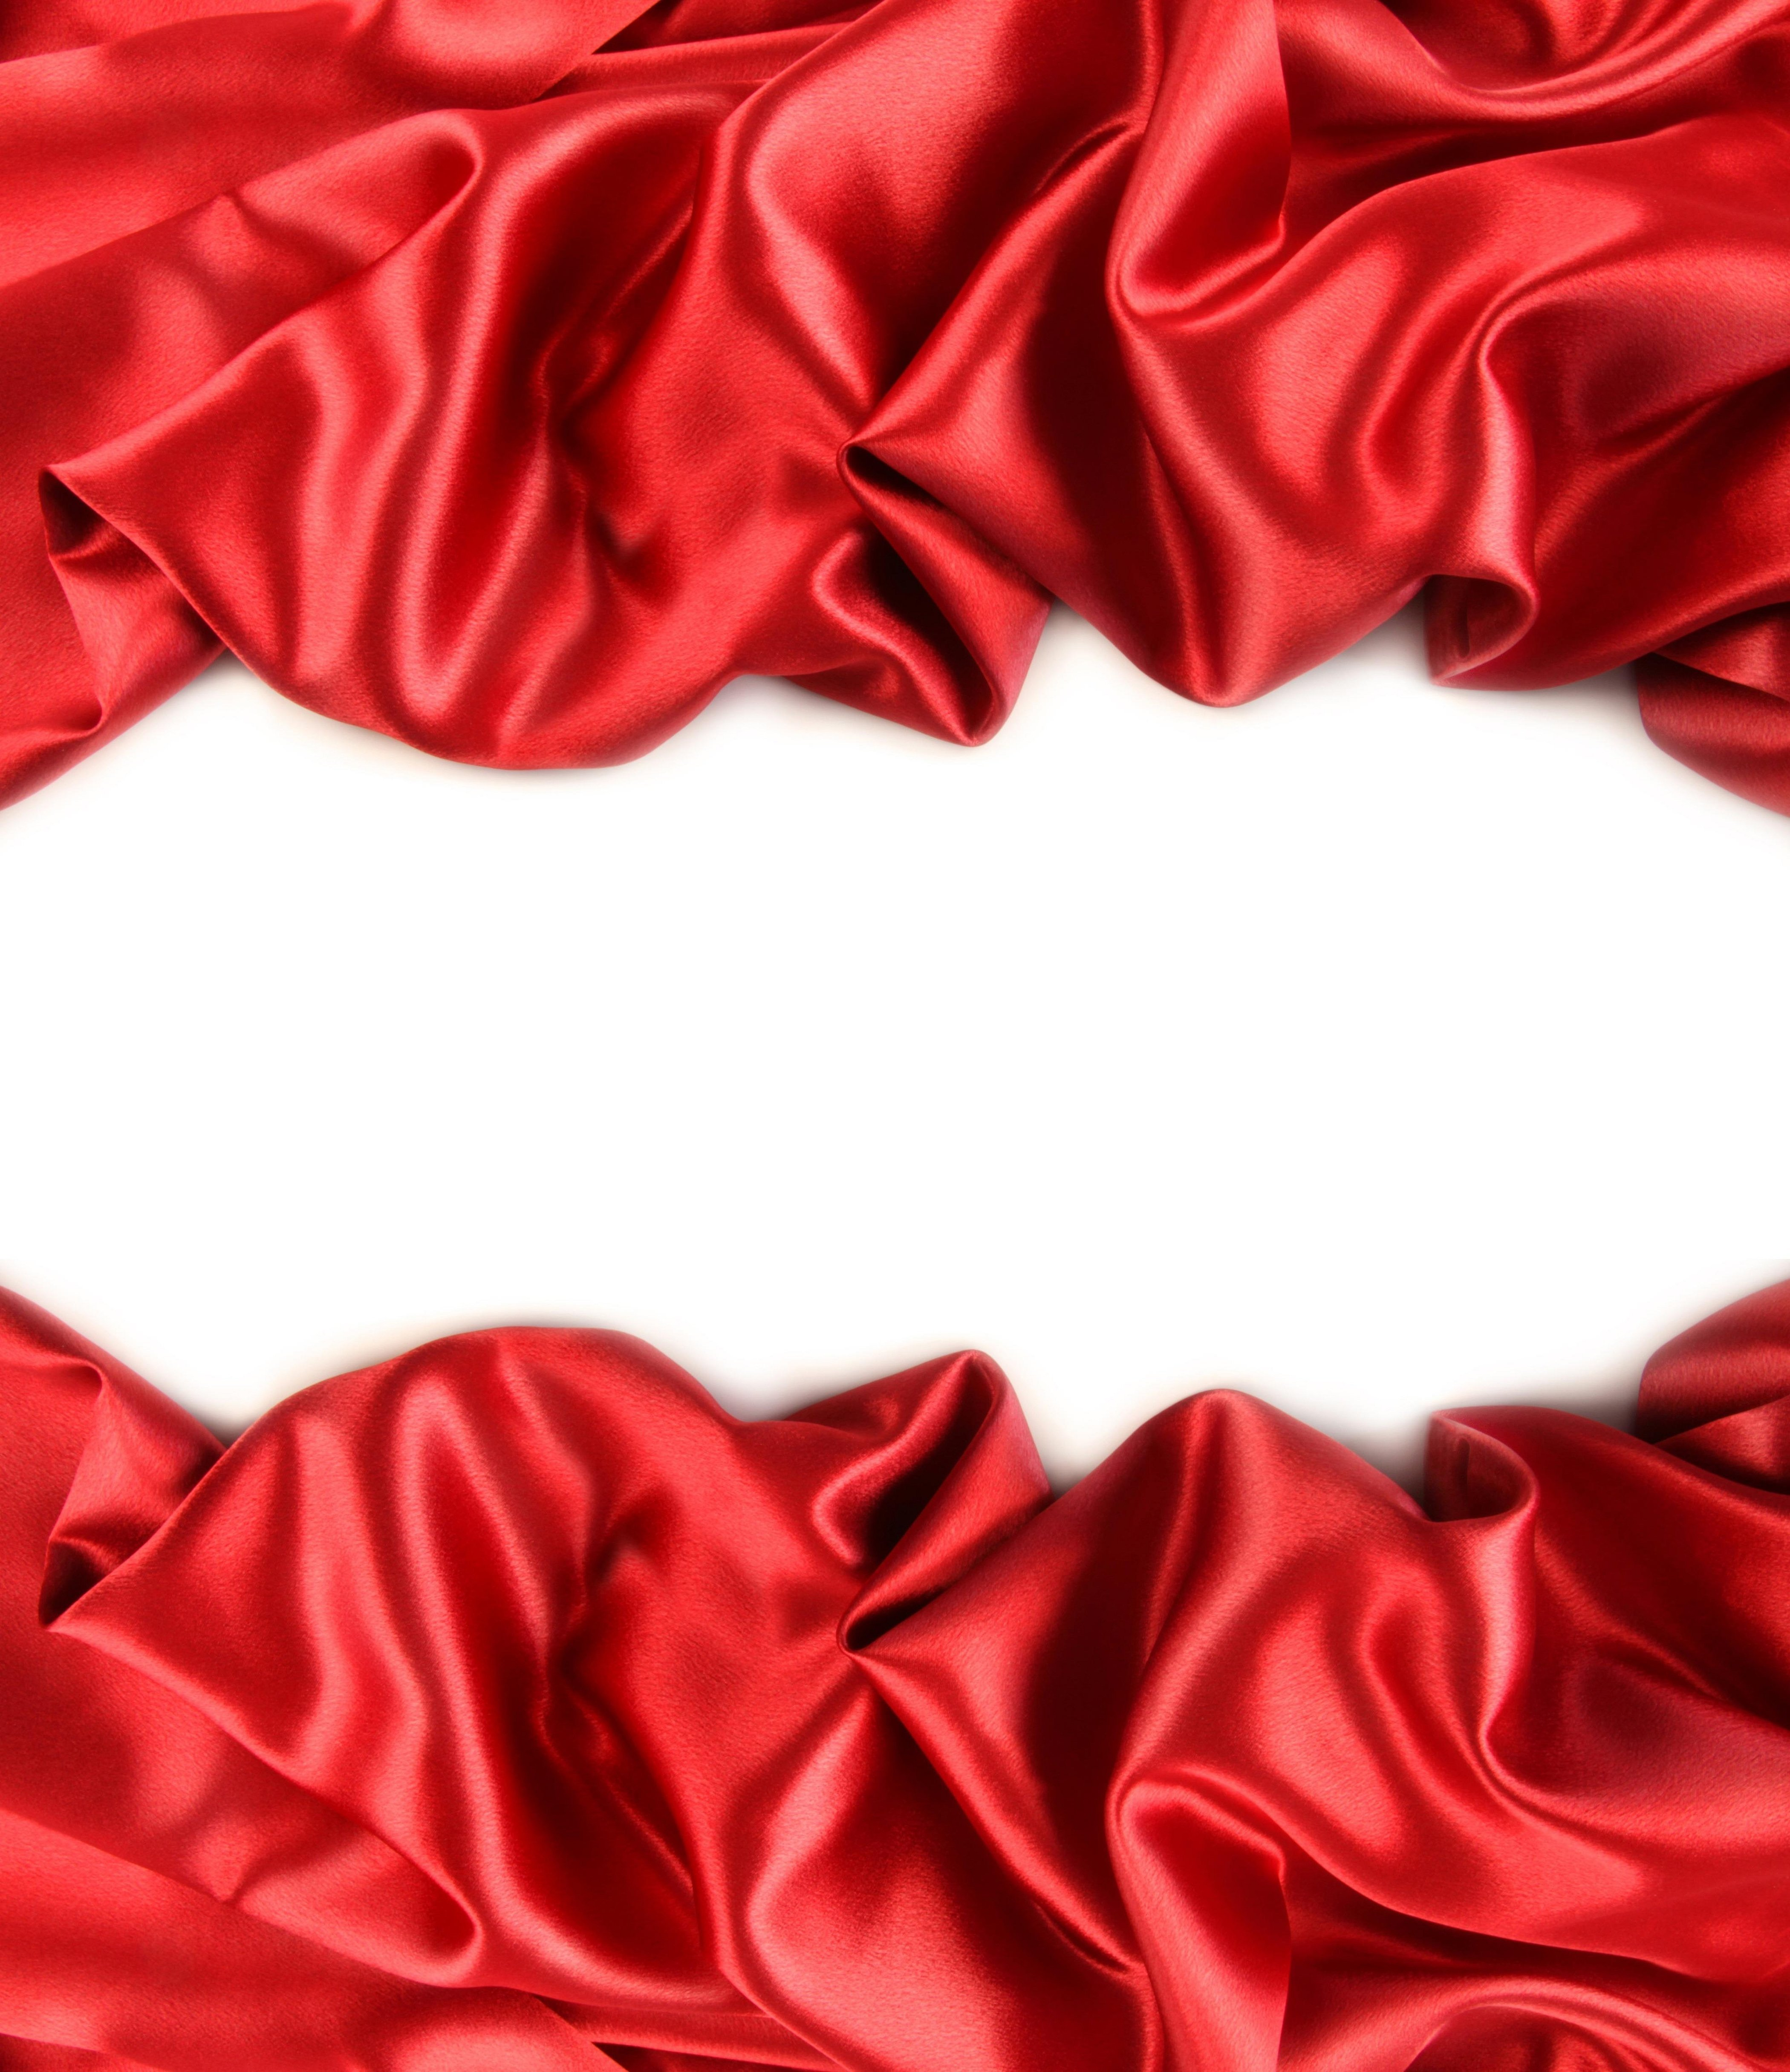 Красная ткань на белом фоне